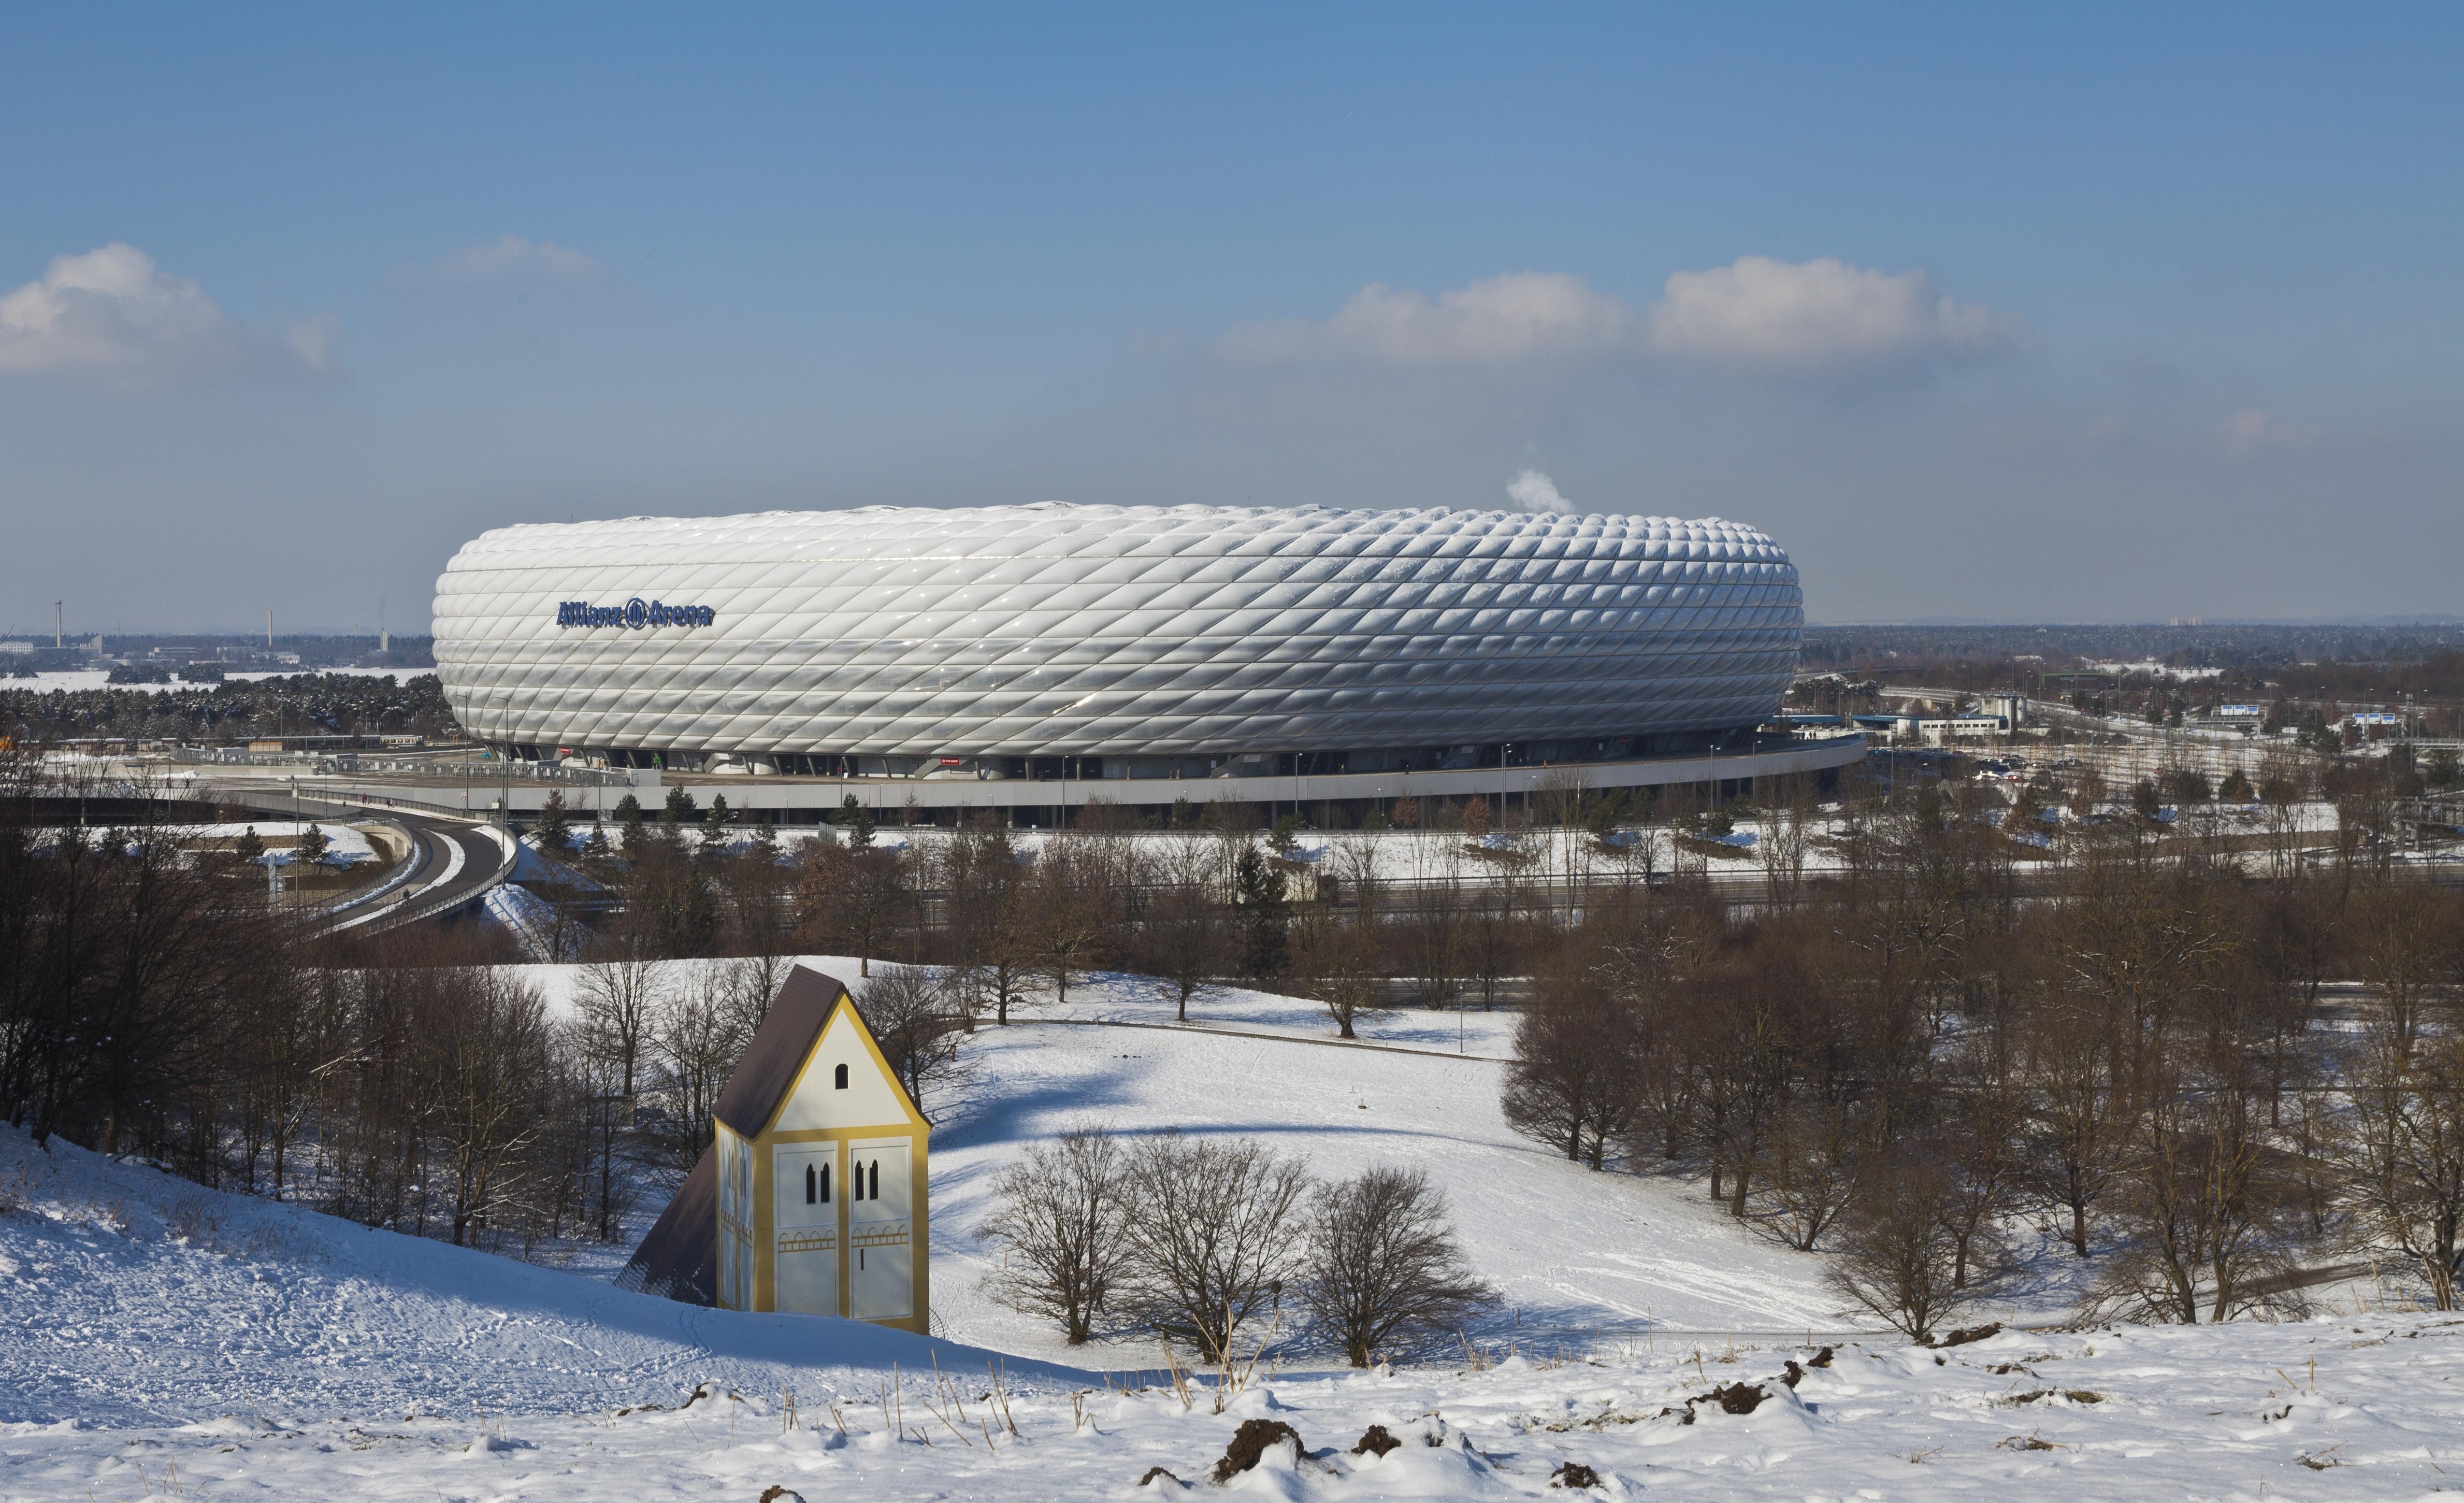 EFTE Allianz Arena